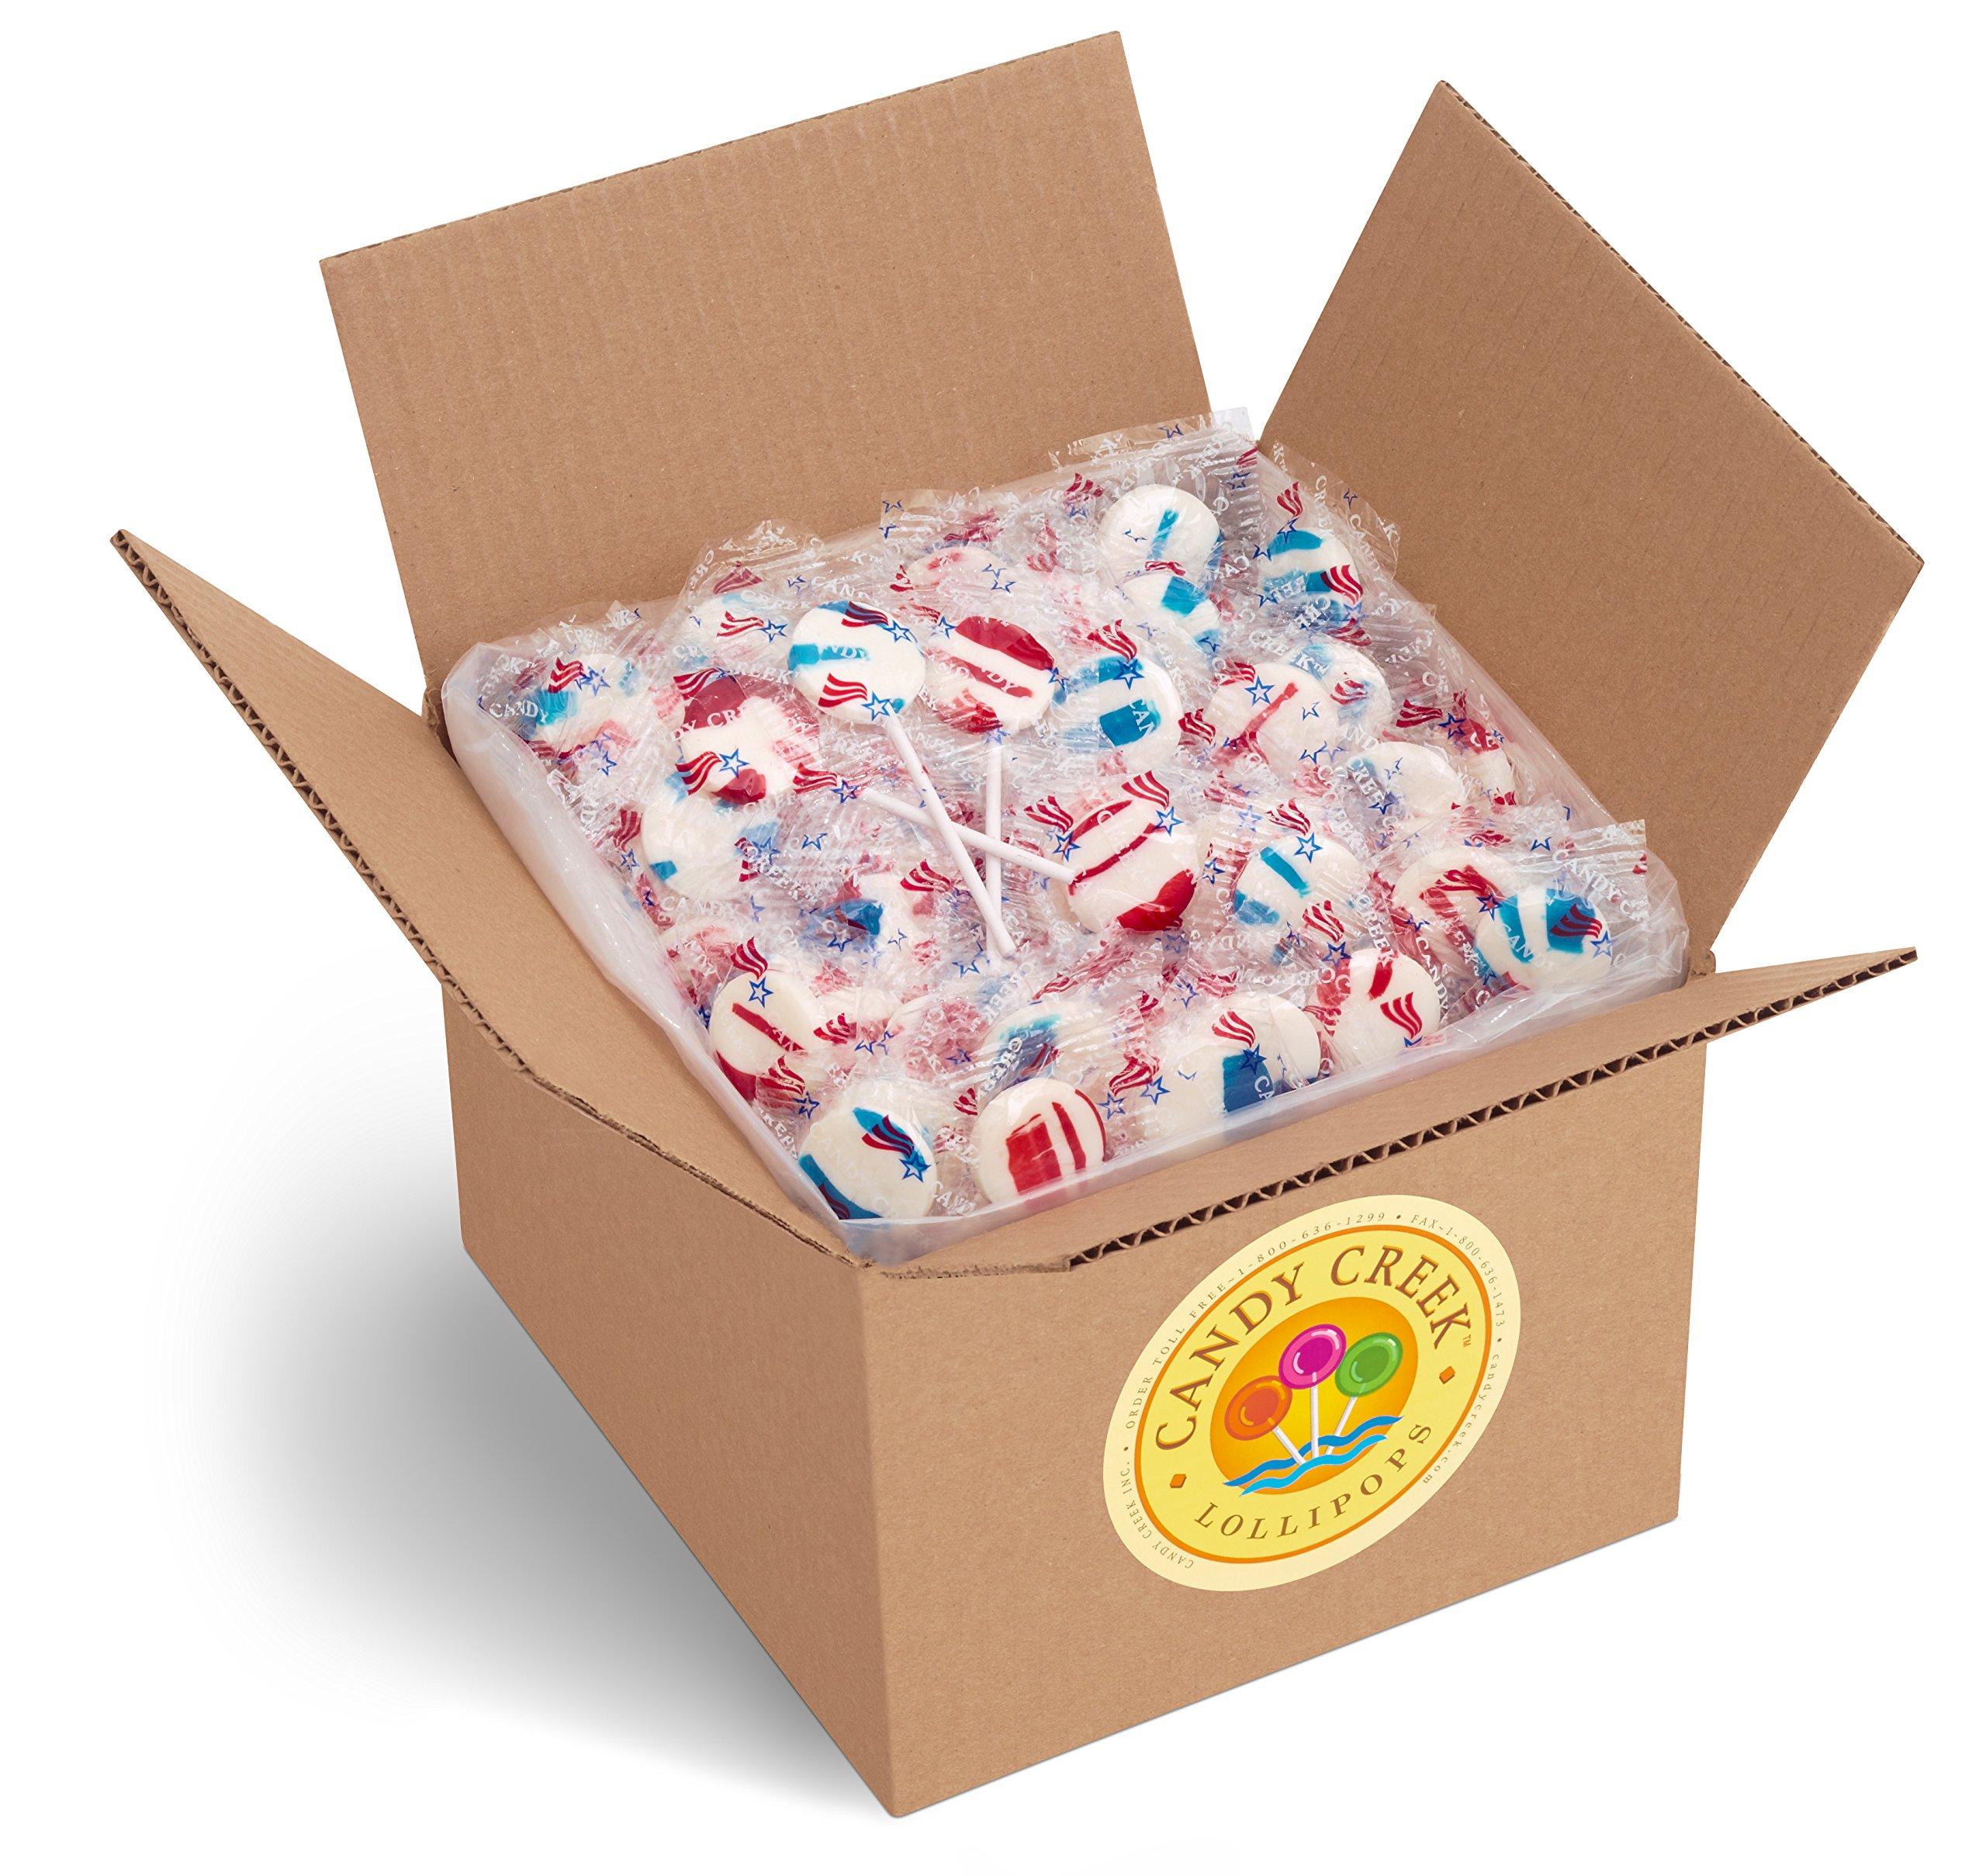 Candy Creek Patriotic Lollipops, Bulk 5 lb. Carton